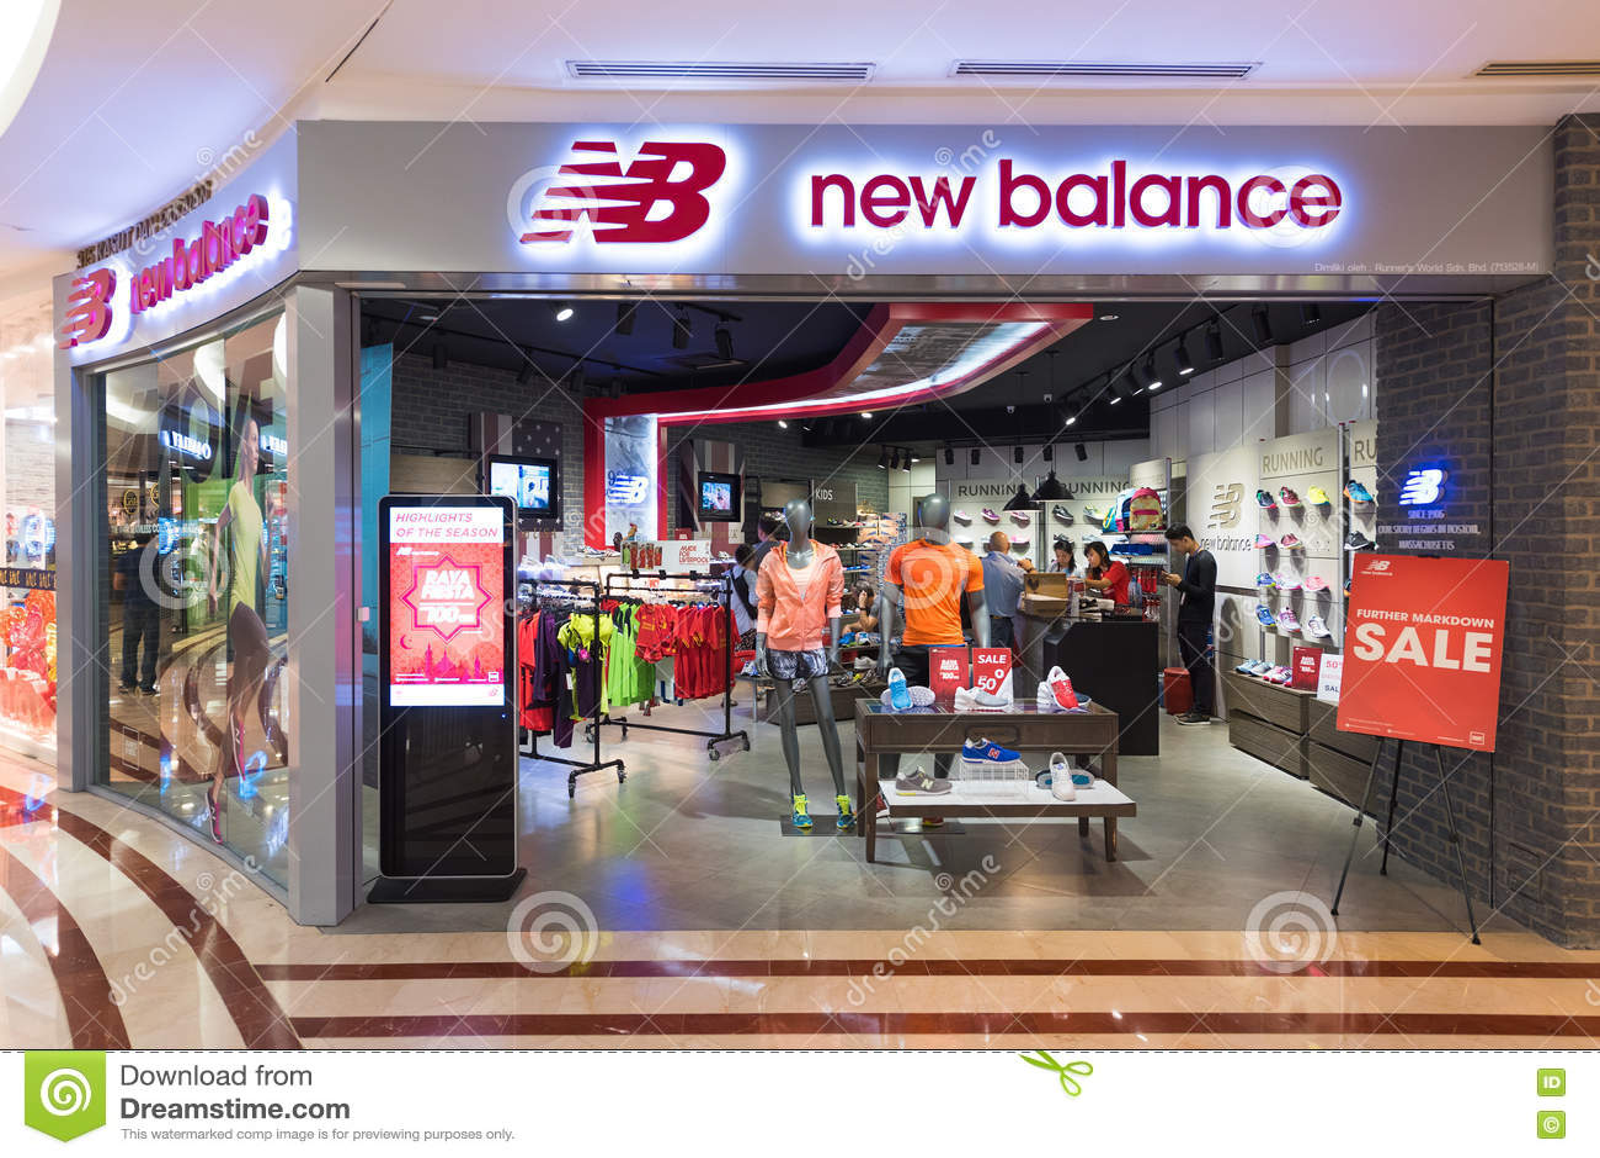 magasin qui vend des new balance